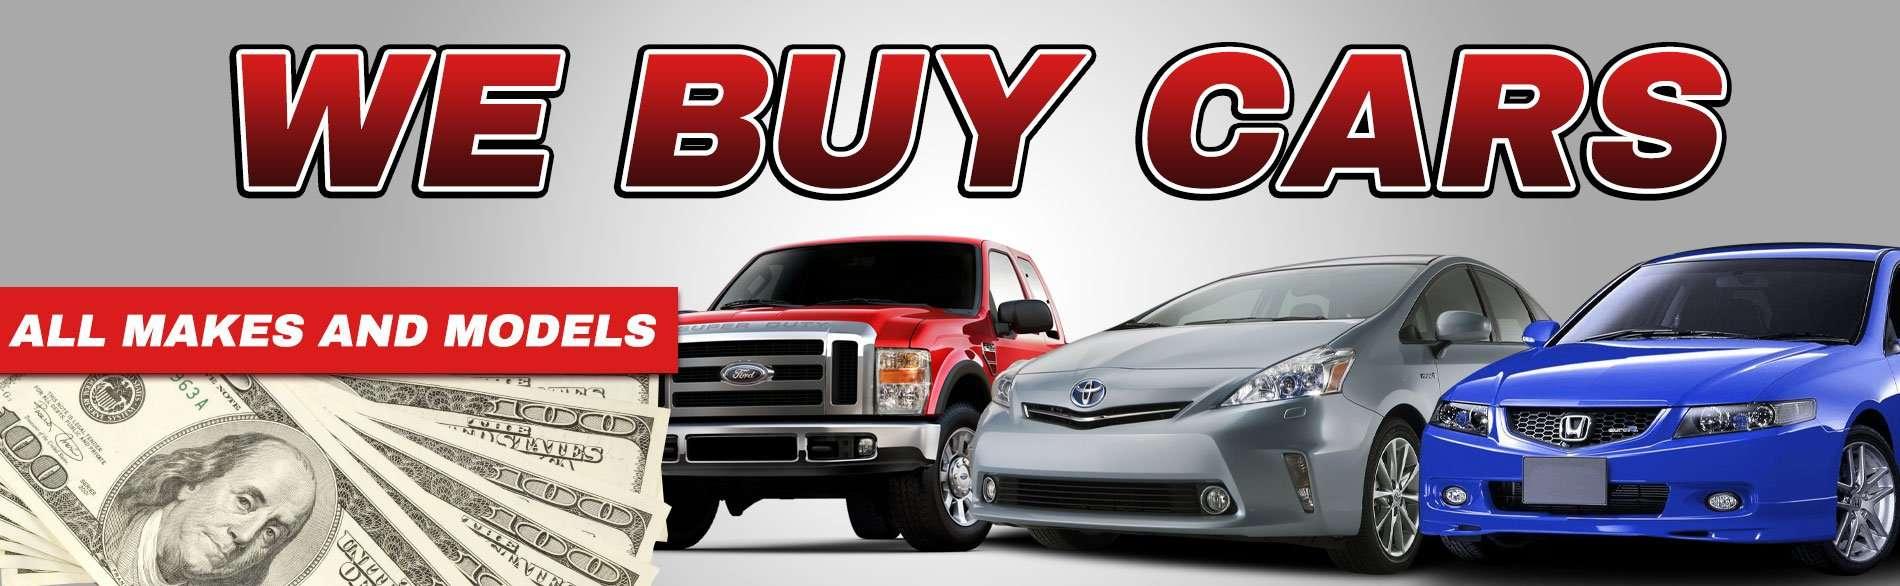 Auto Service Group, Profile News - بروفايل نيوز